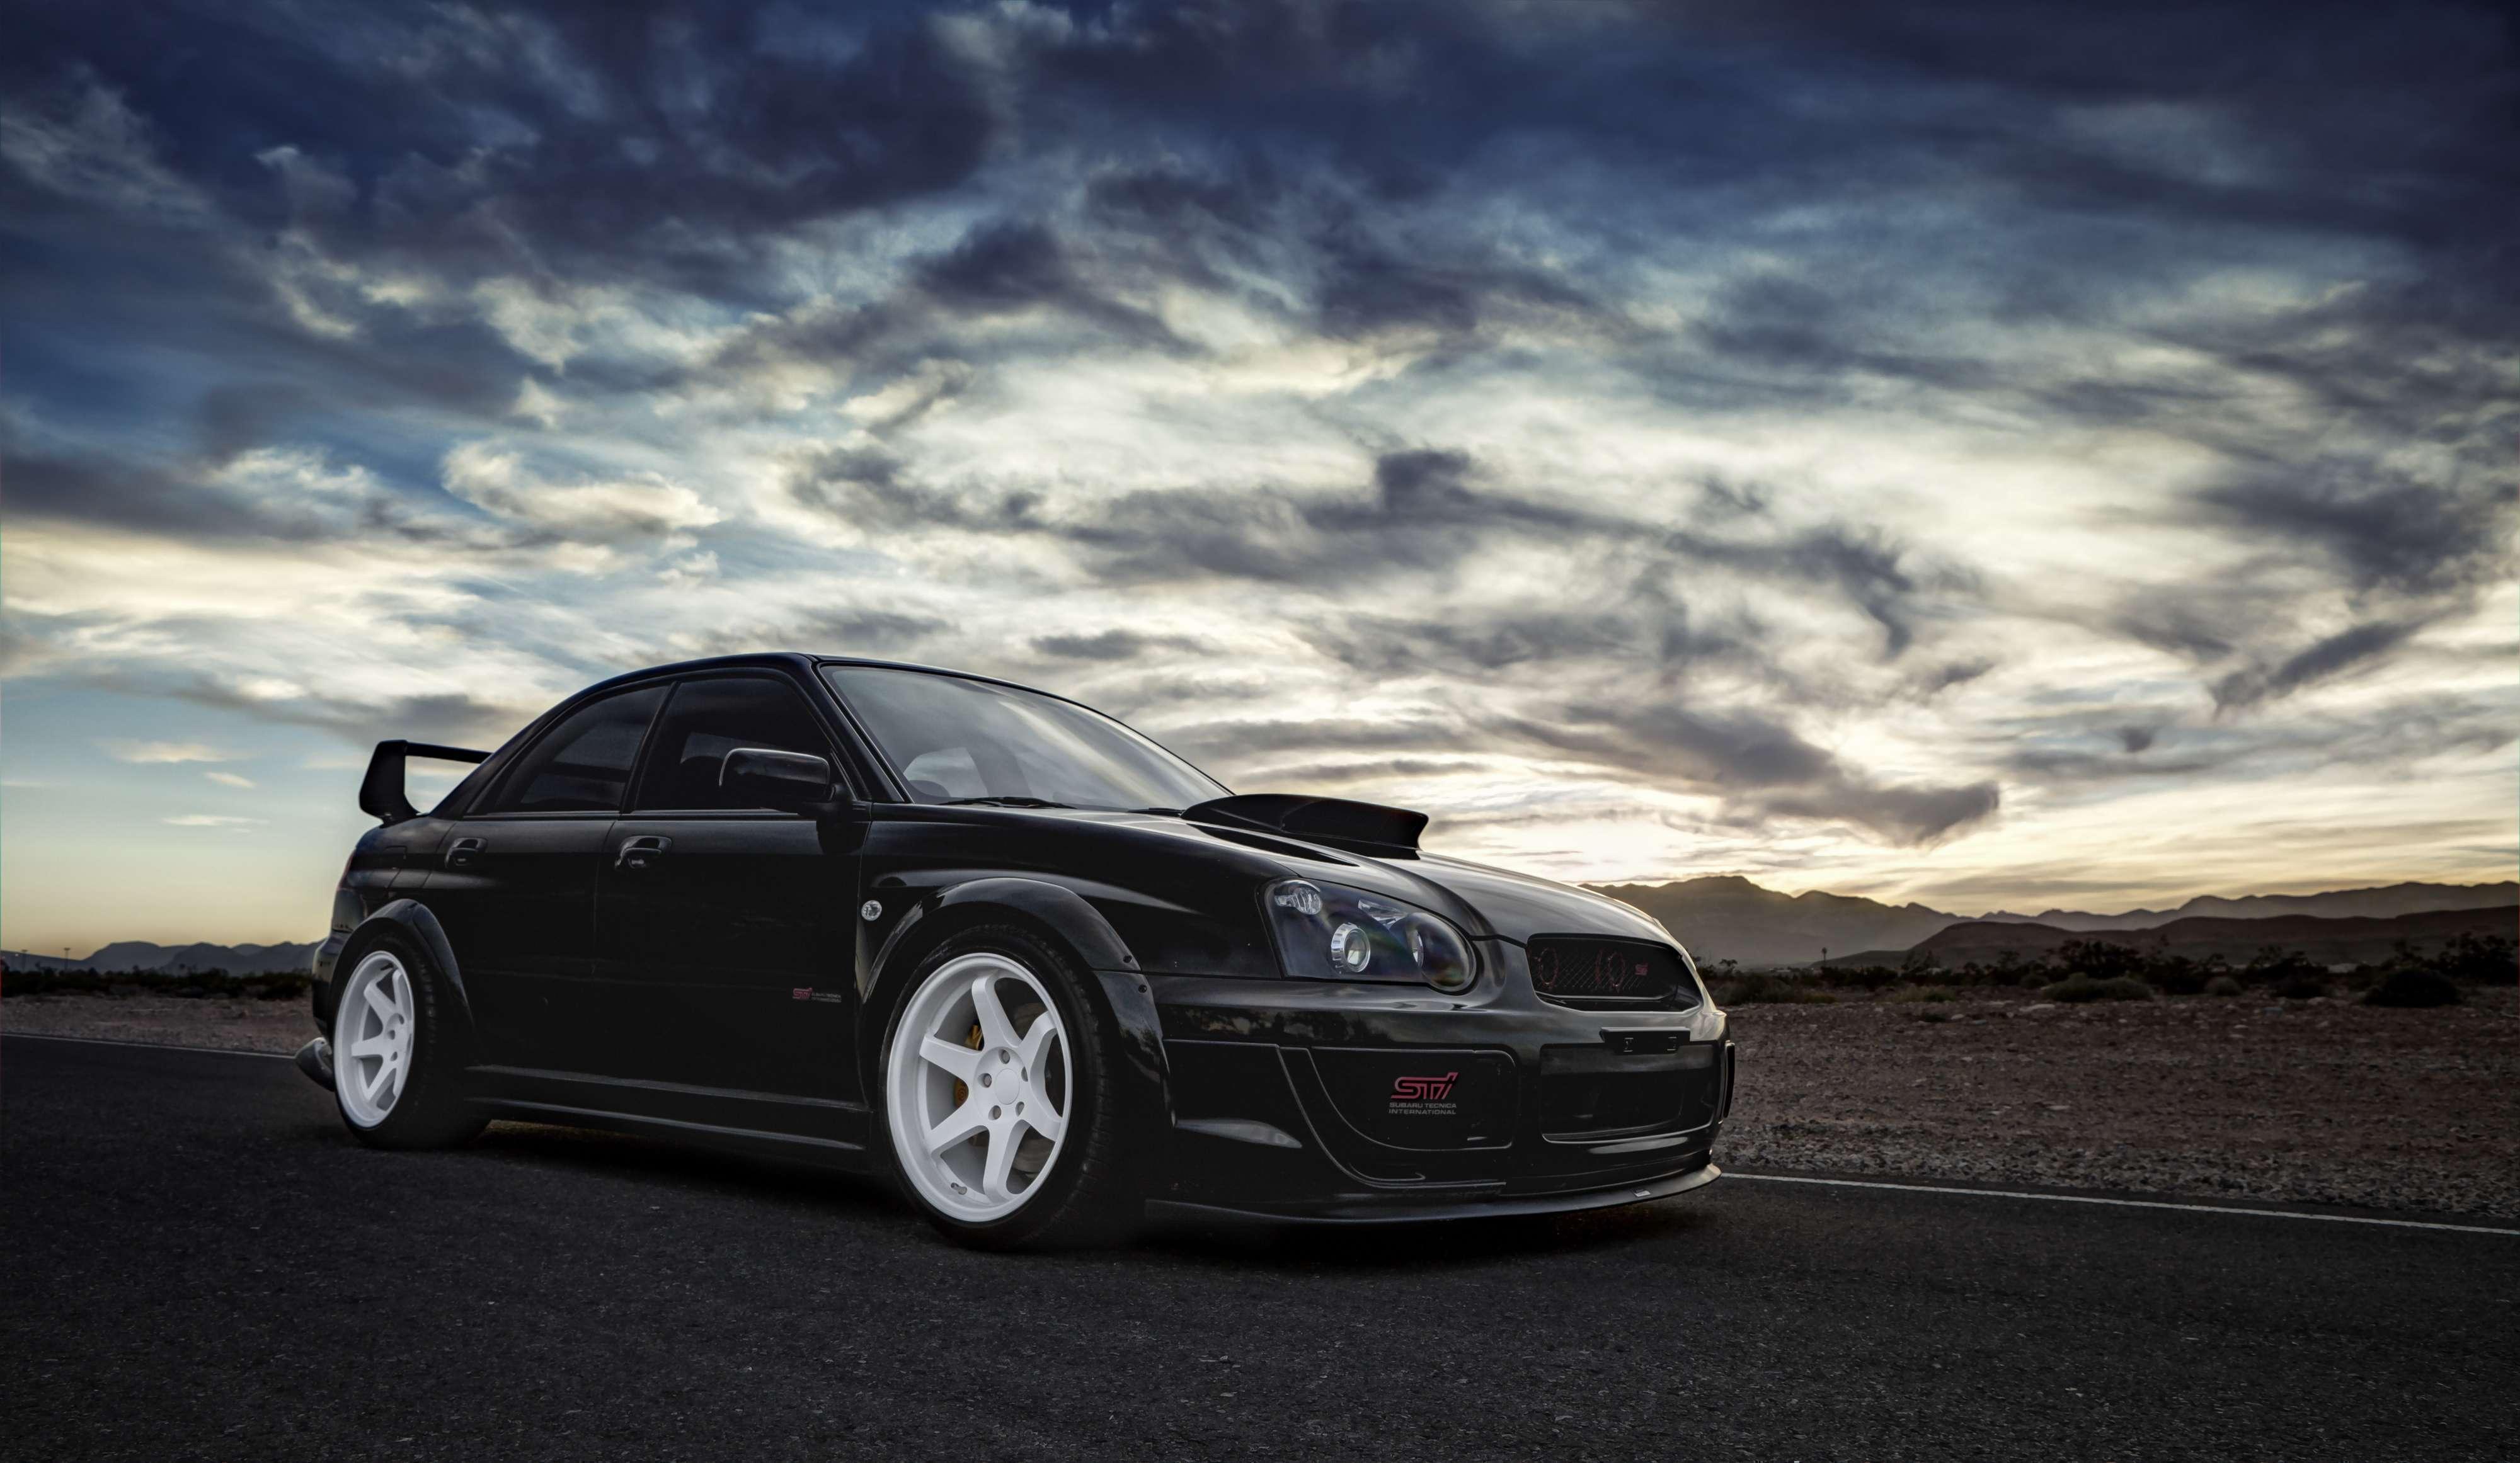 Free Download Subaru Impreza Wrx Sti Wallpapers Hd Car